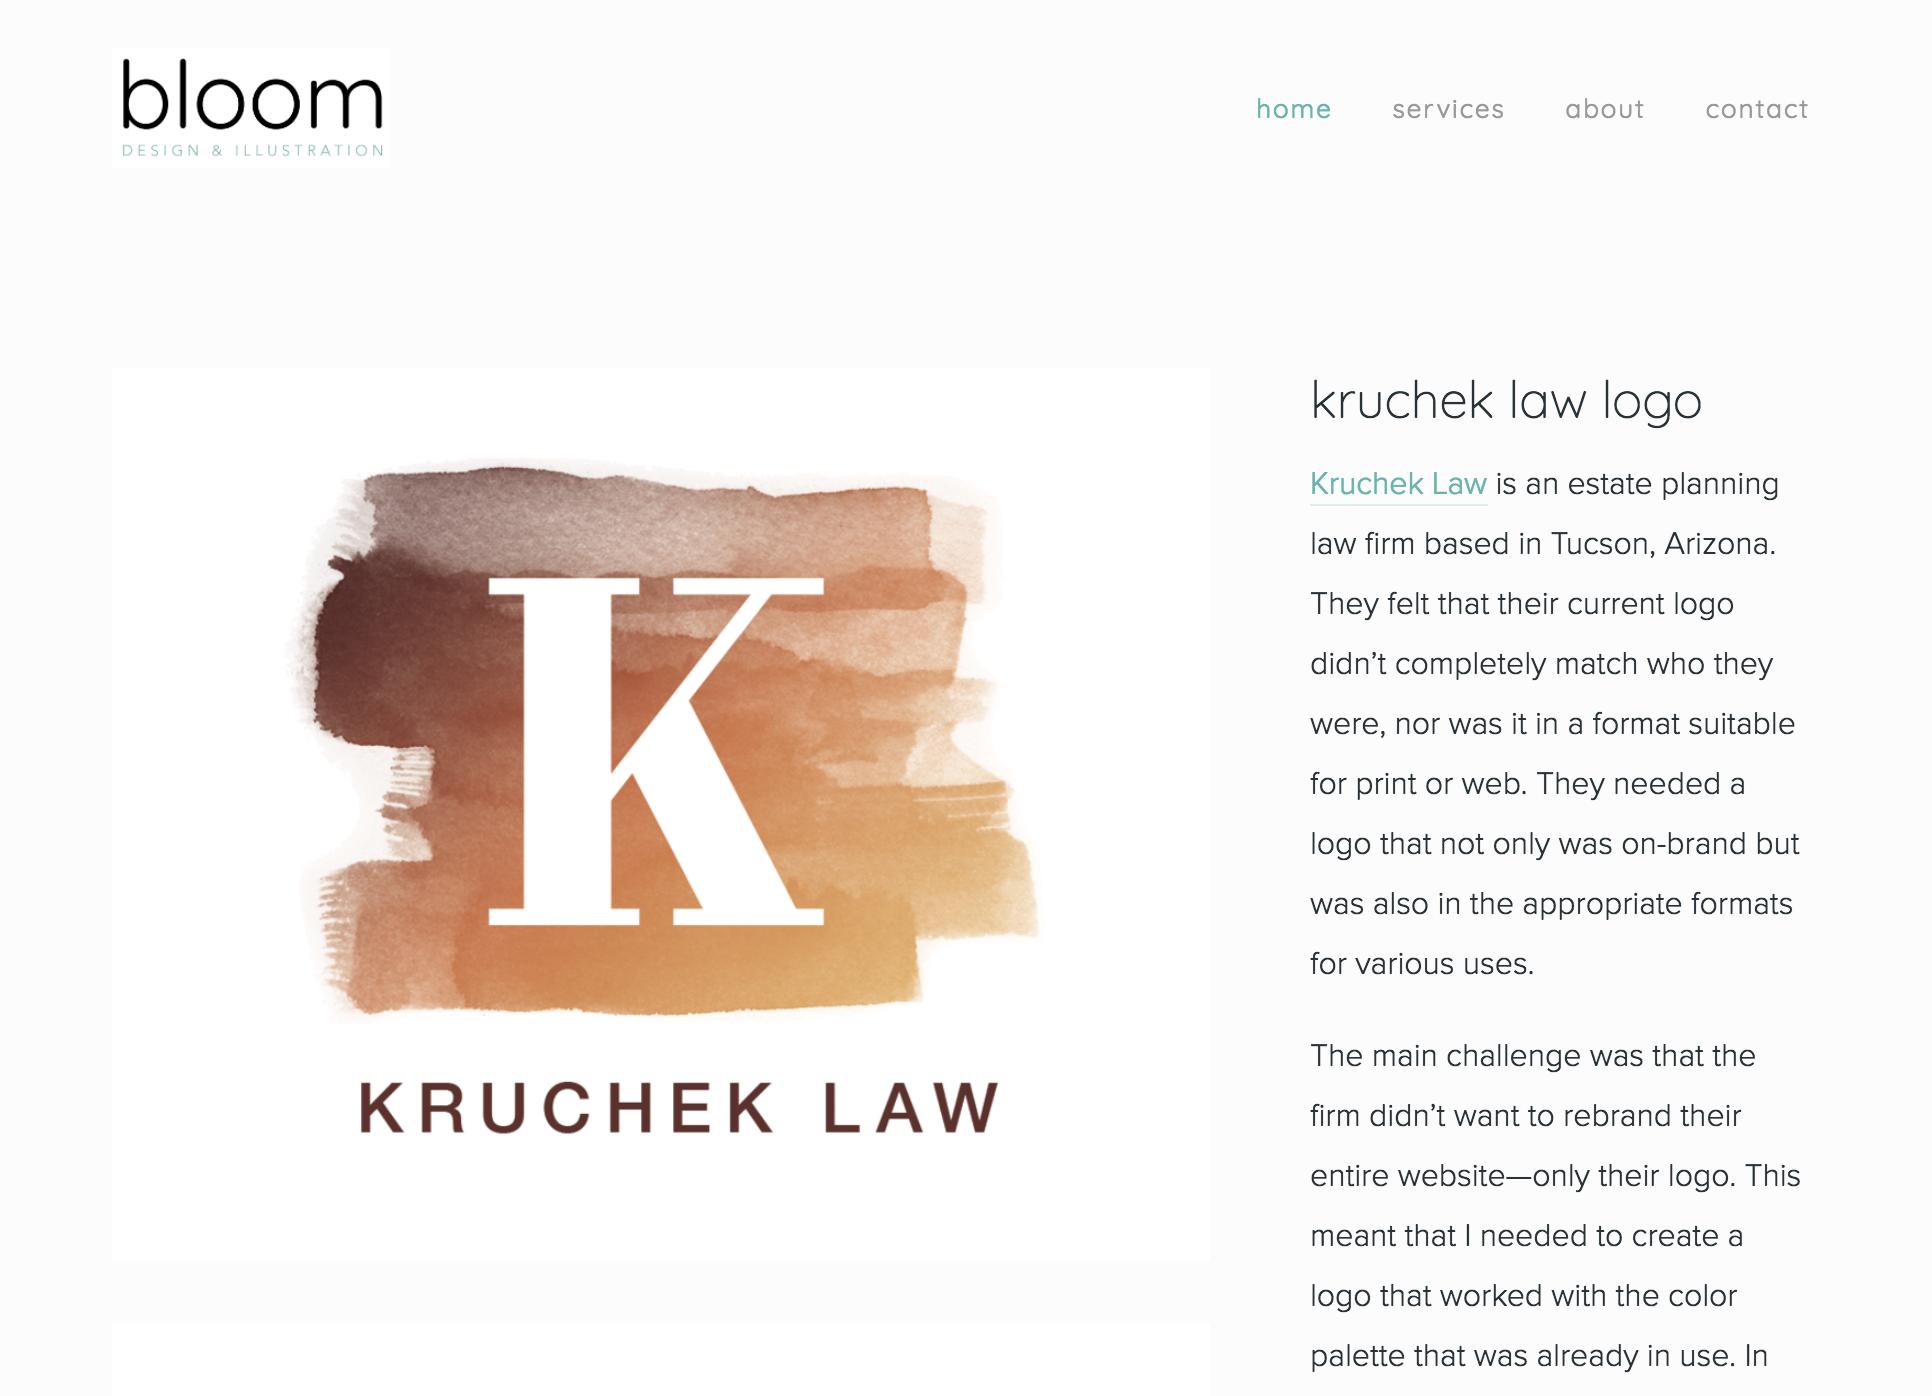 Bloom Design & Illustration portfolio sample - Kruchek Law logo design